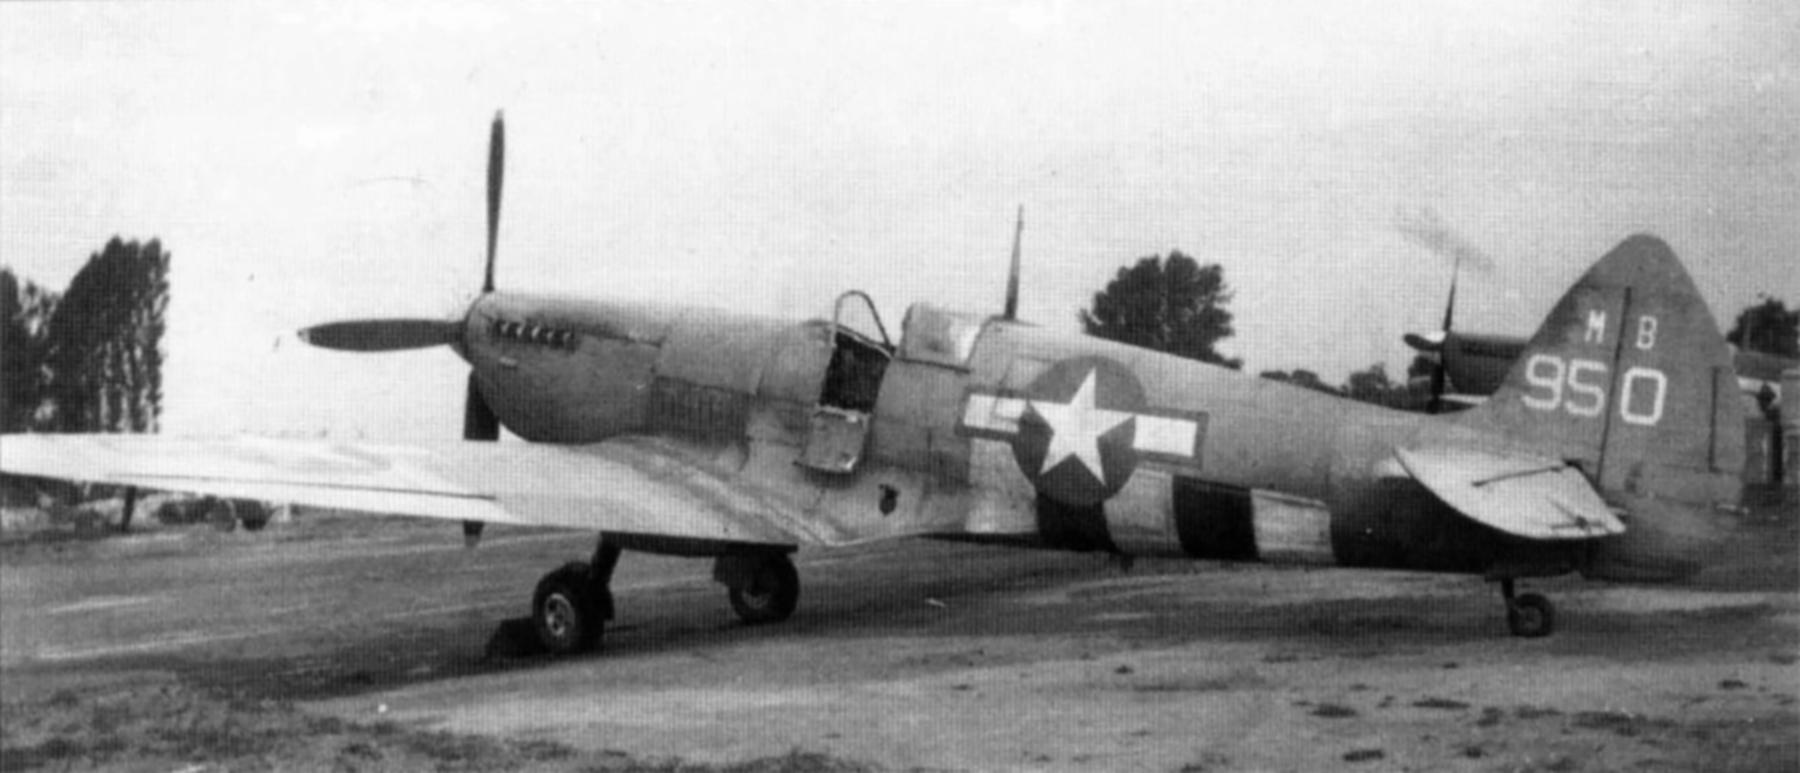 Spitfire PRXIT USAAF 7PG14PS MB950 Mount Farm England 1943 03